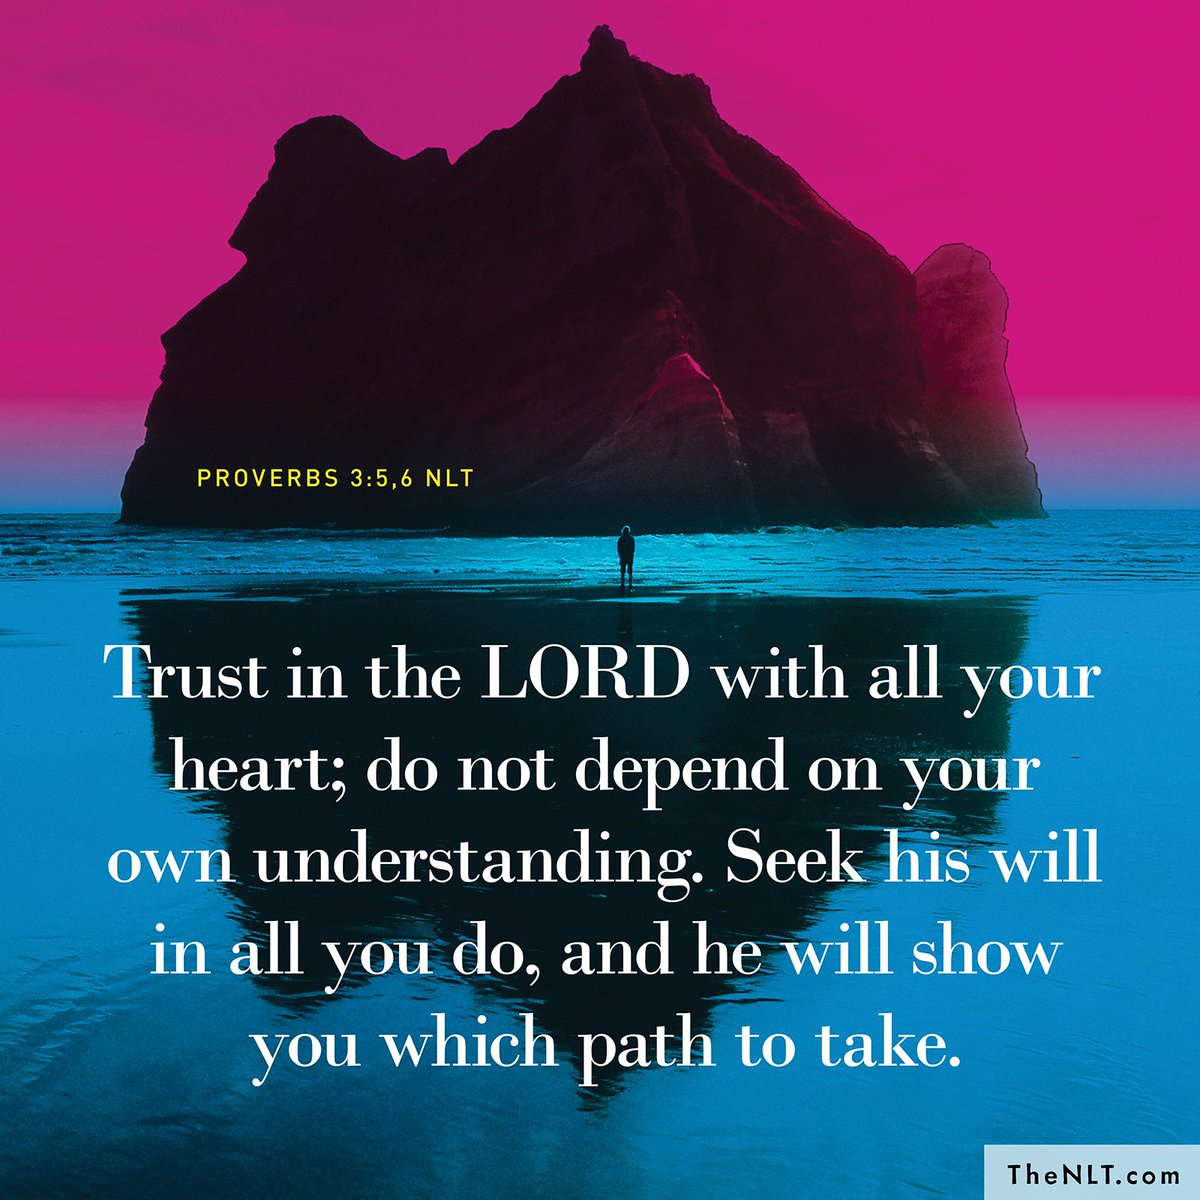 NLT Bible Verse on Twitter: